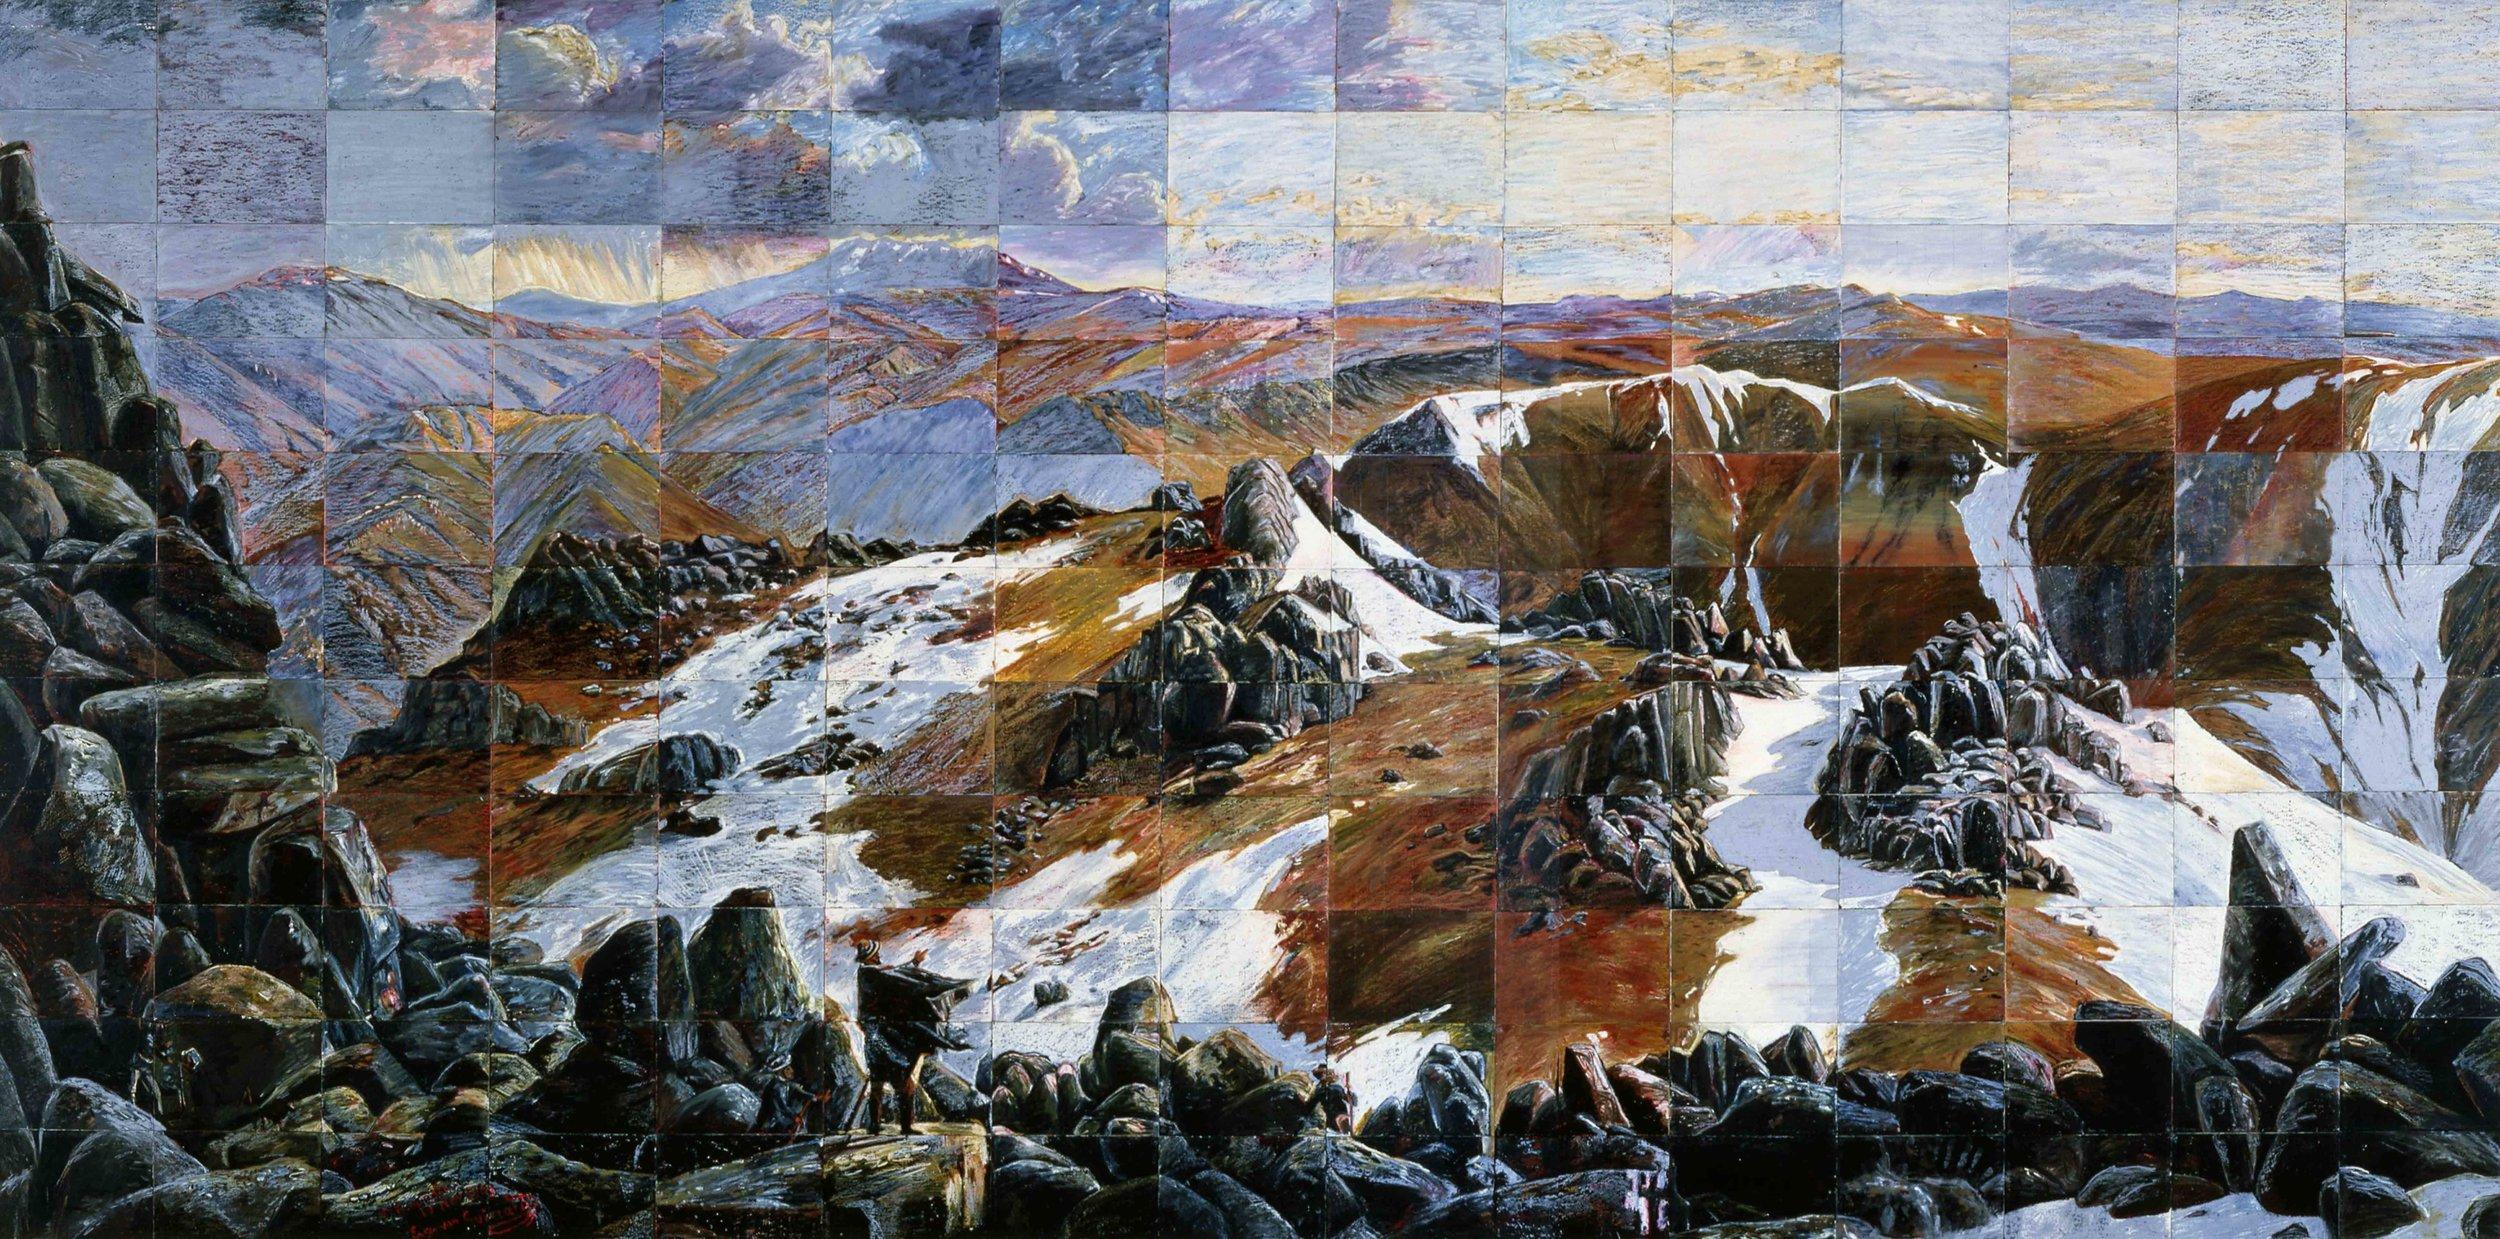 Mount Analogue, 1985